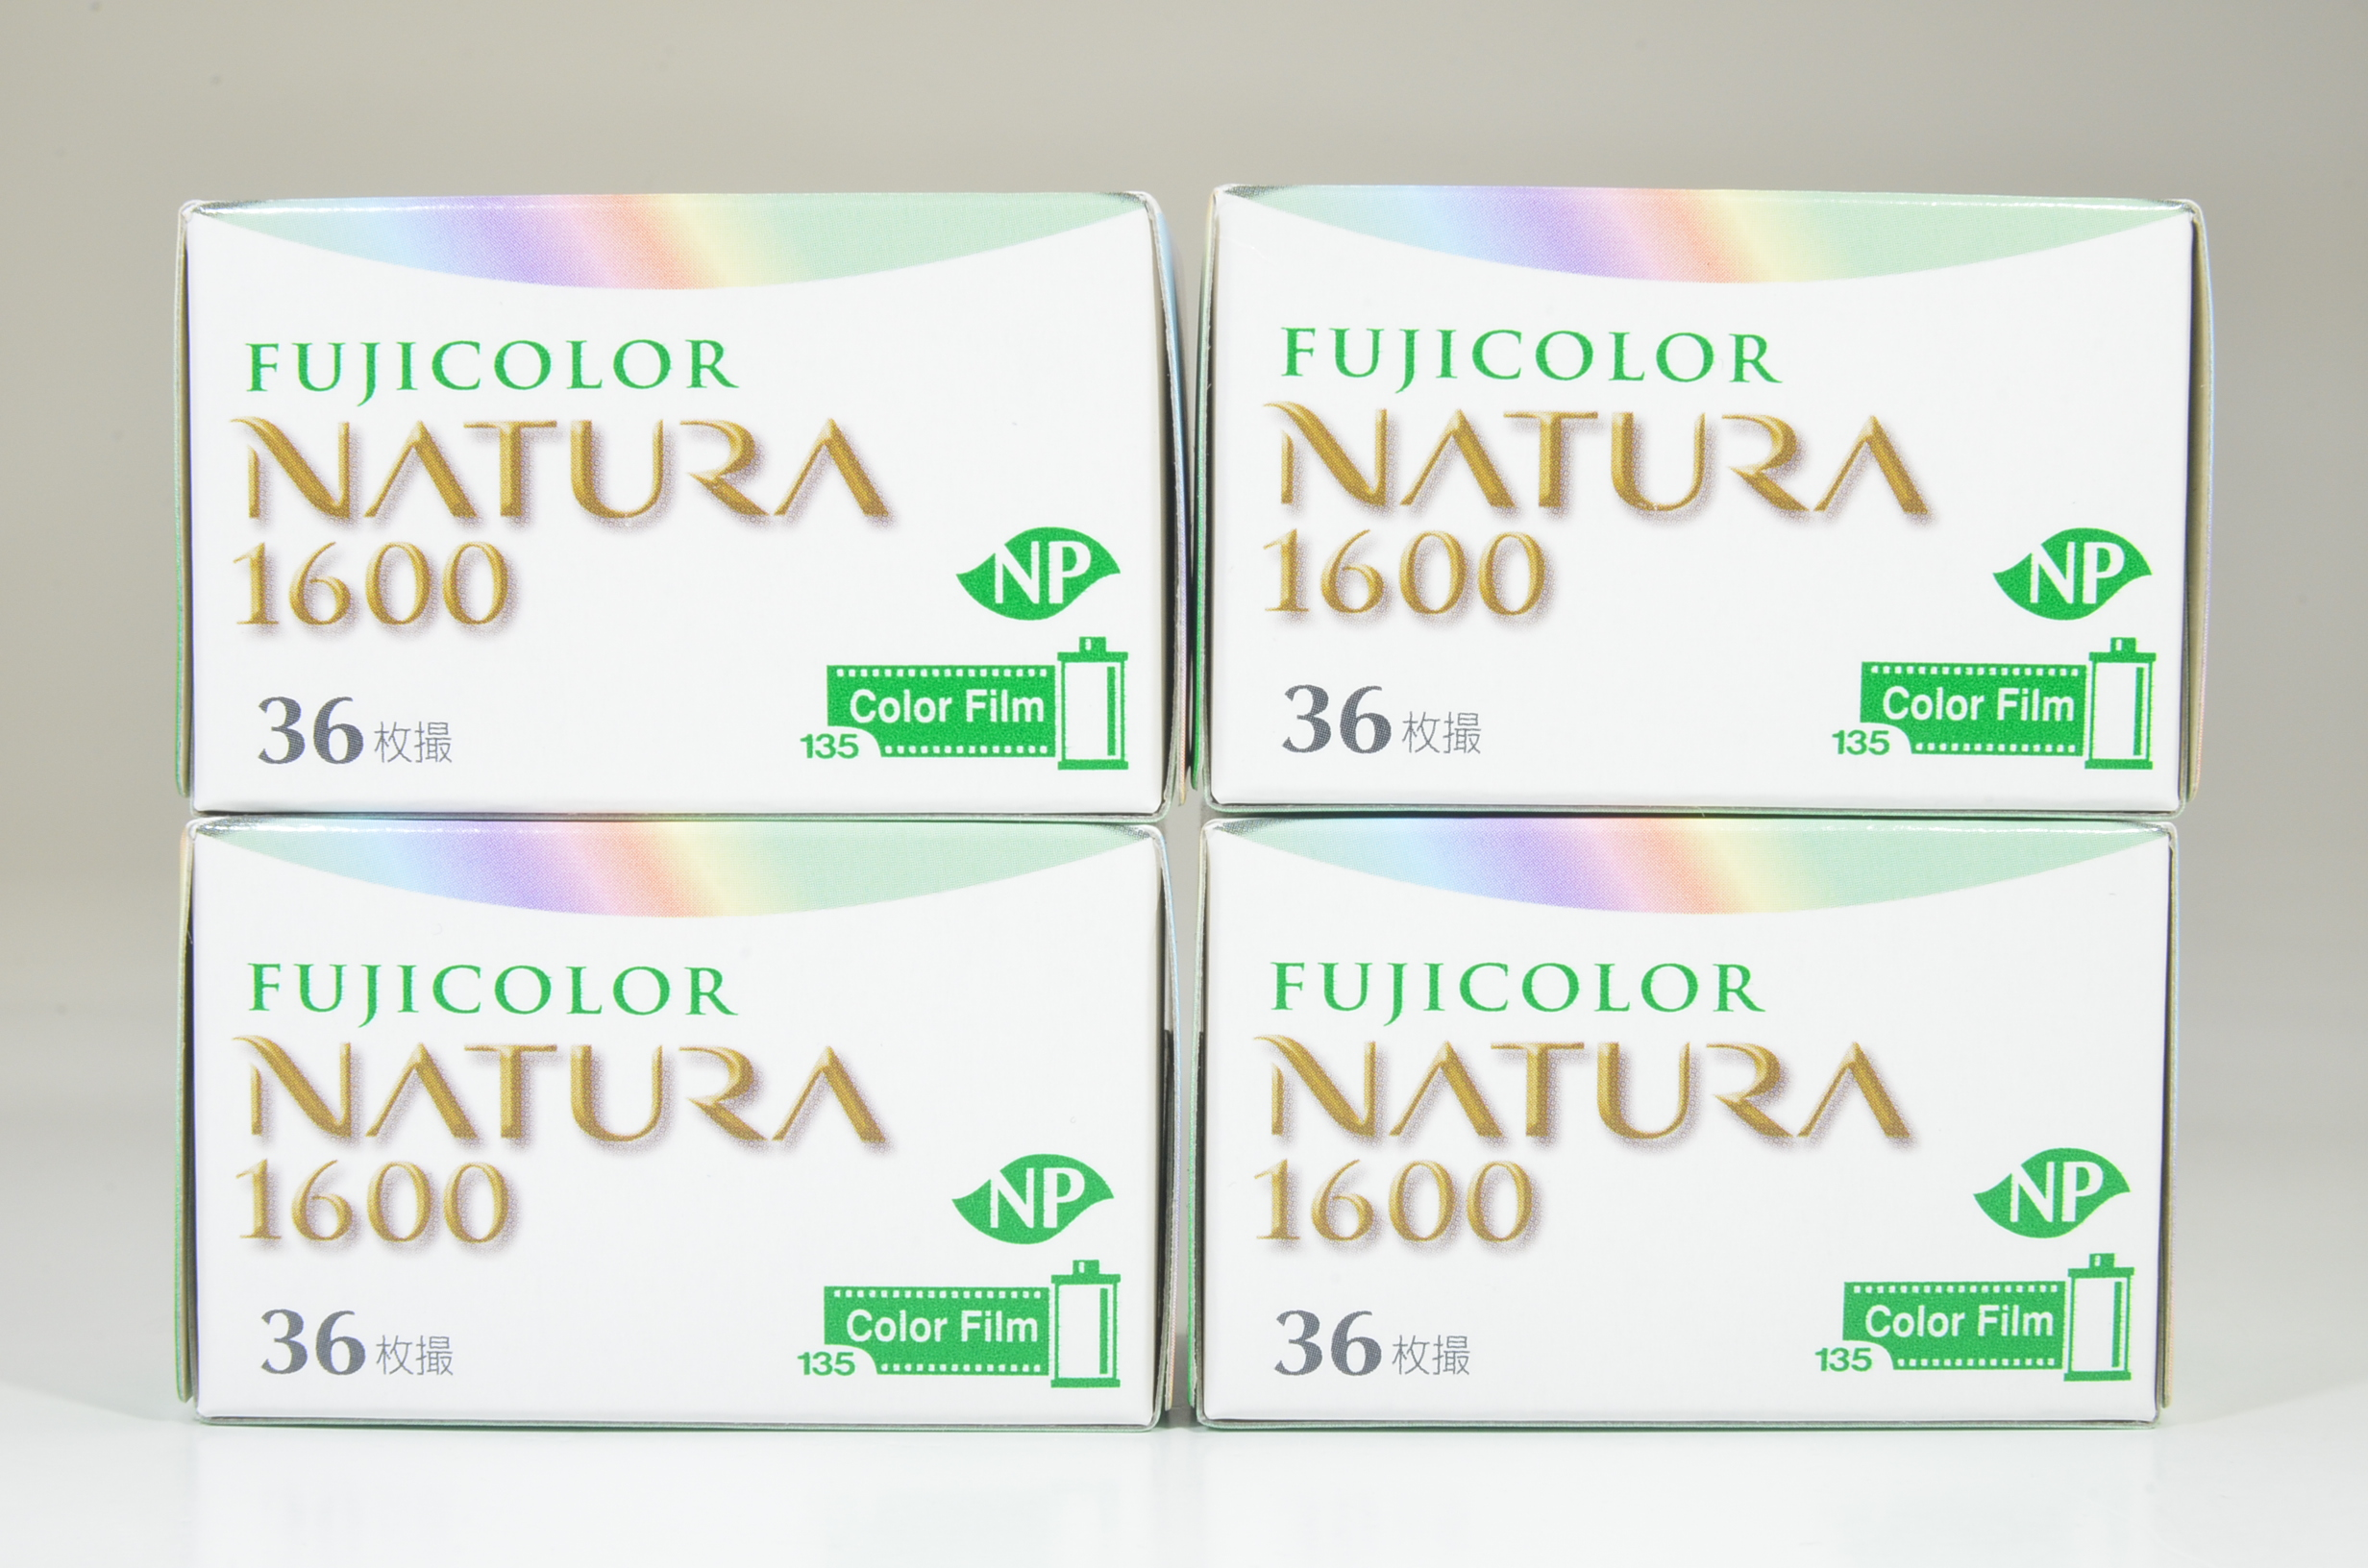 fujifilm fujicolor natura 1600 color negative film expired 2019-12